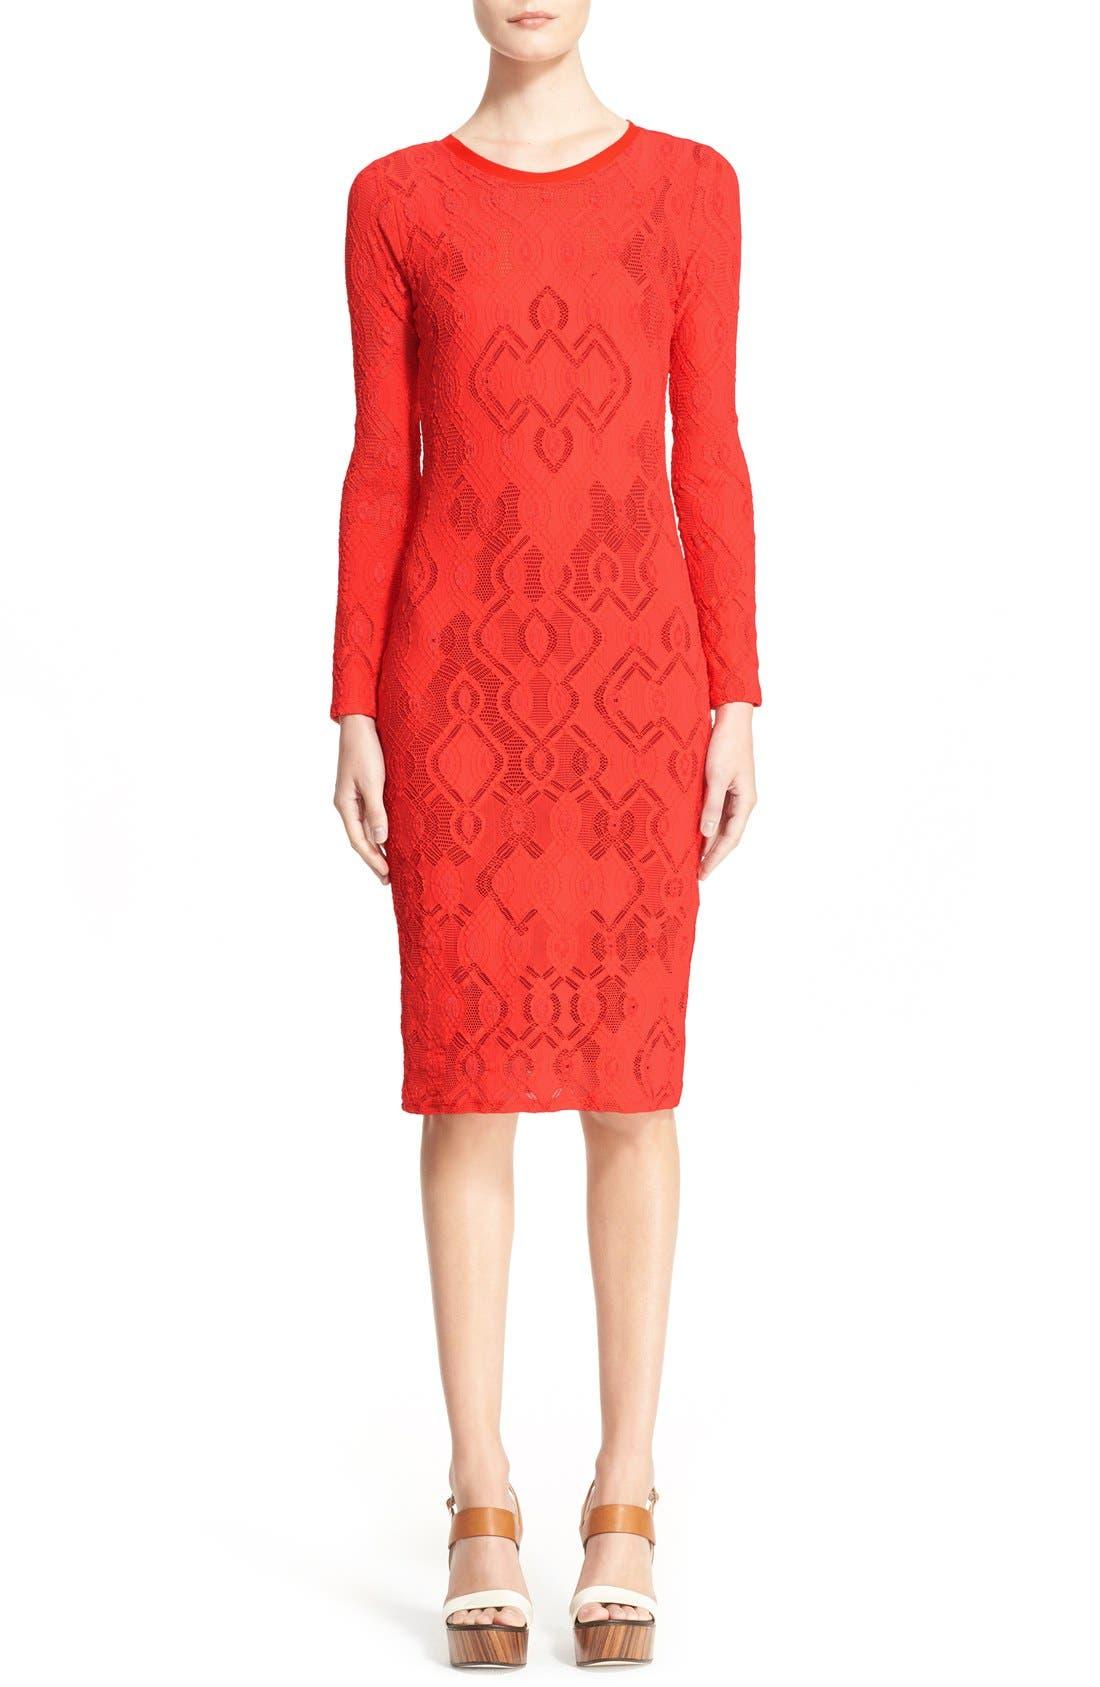 Alternate Image 1 Selected - Fuzzi Long Sleeve Geo Lace Sheath Dress